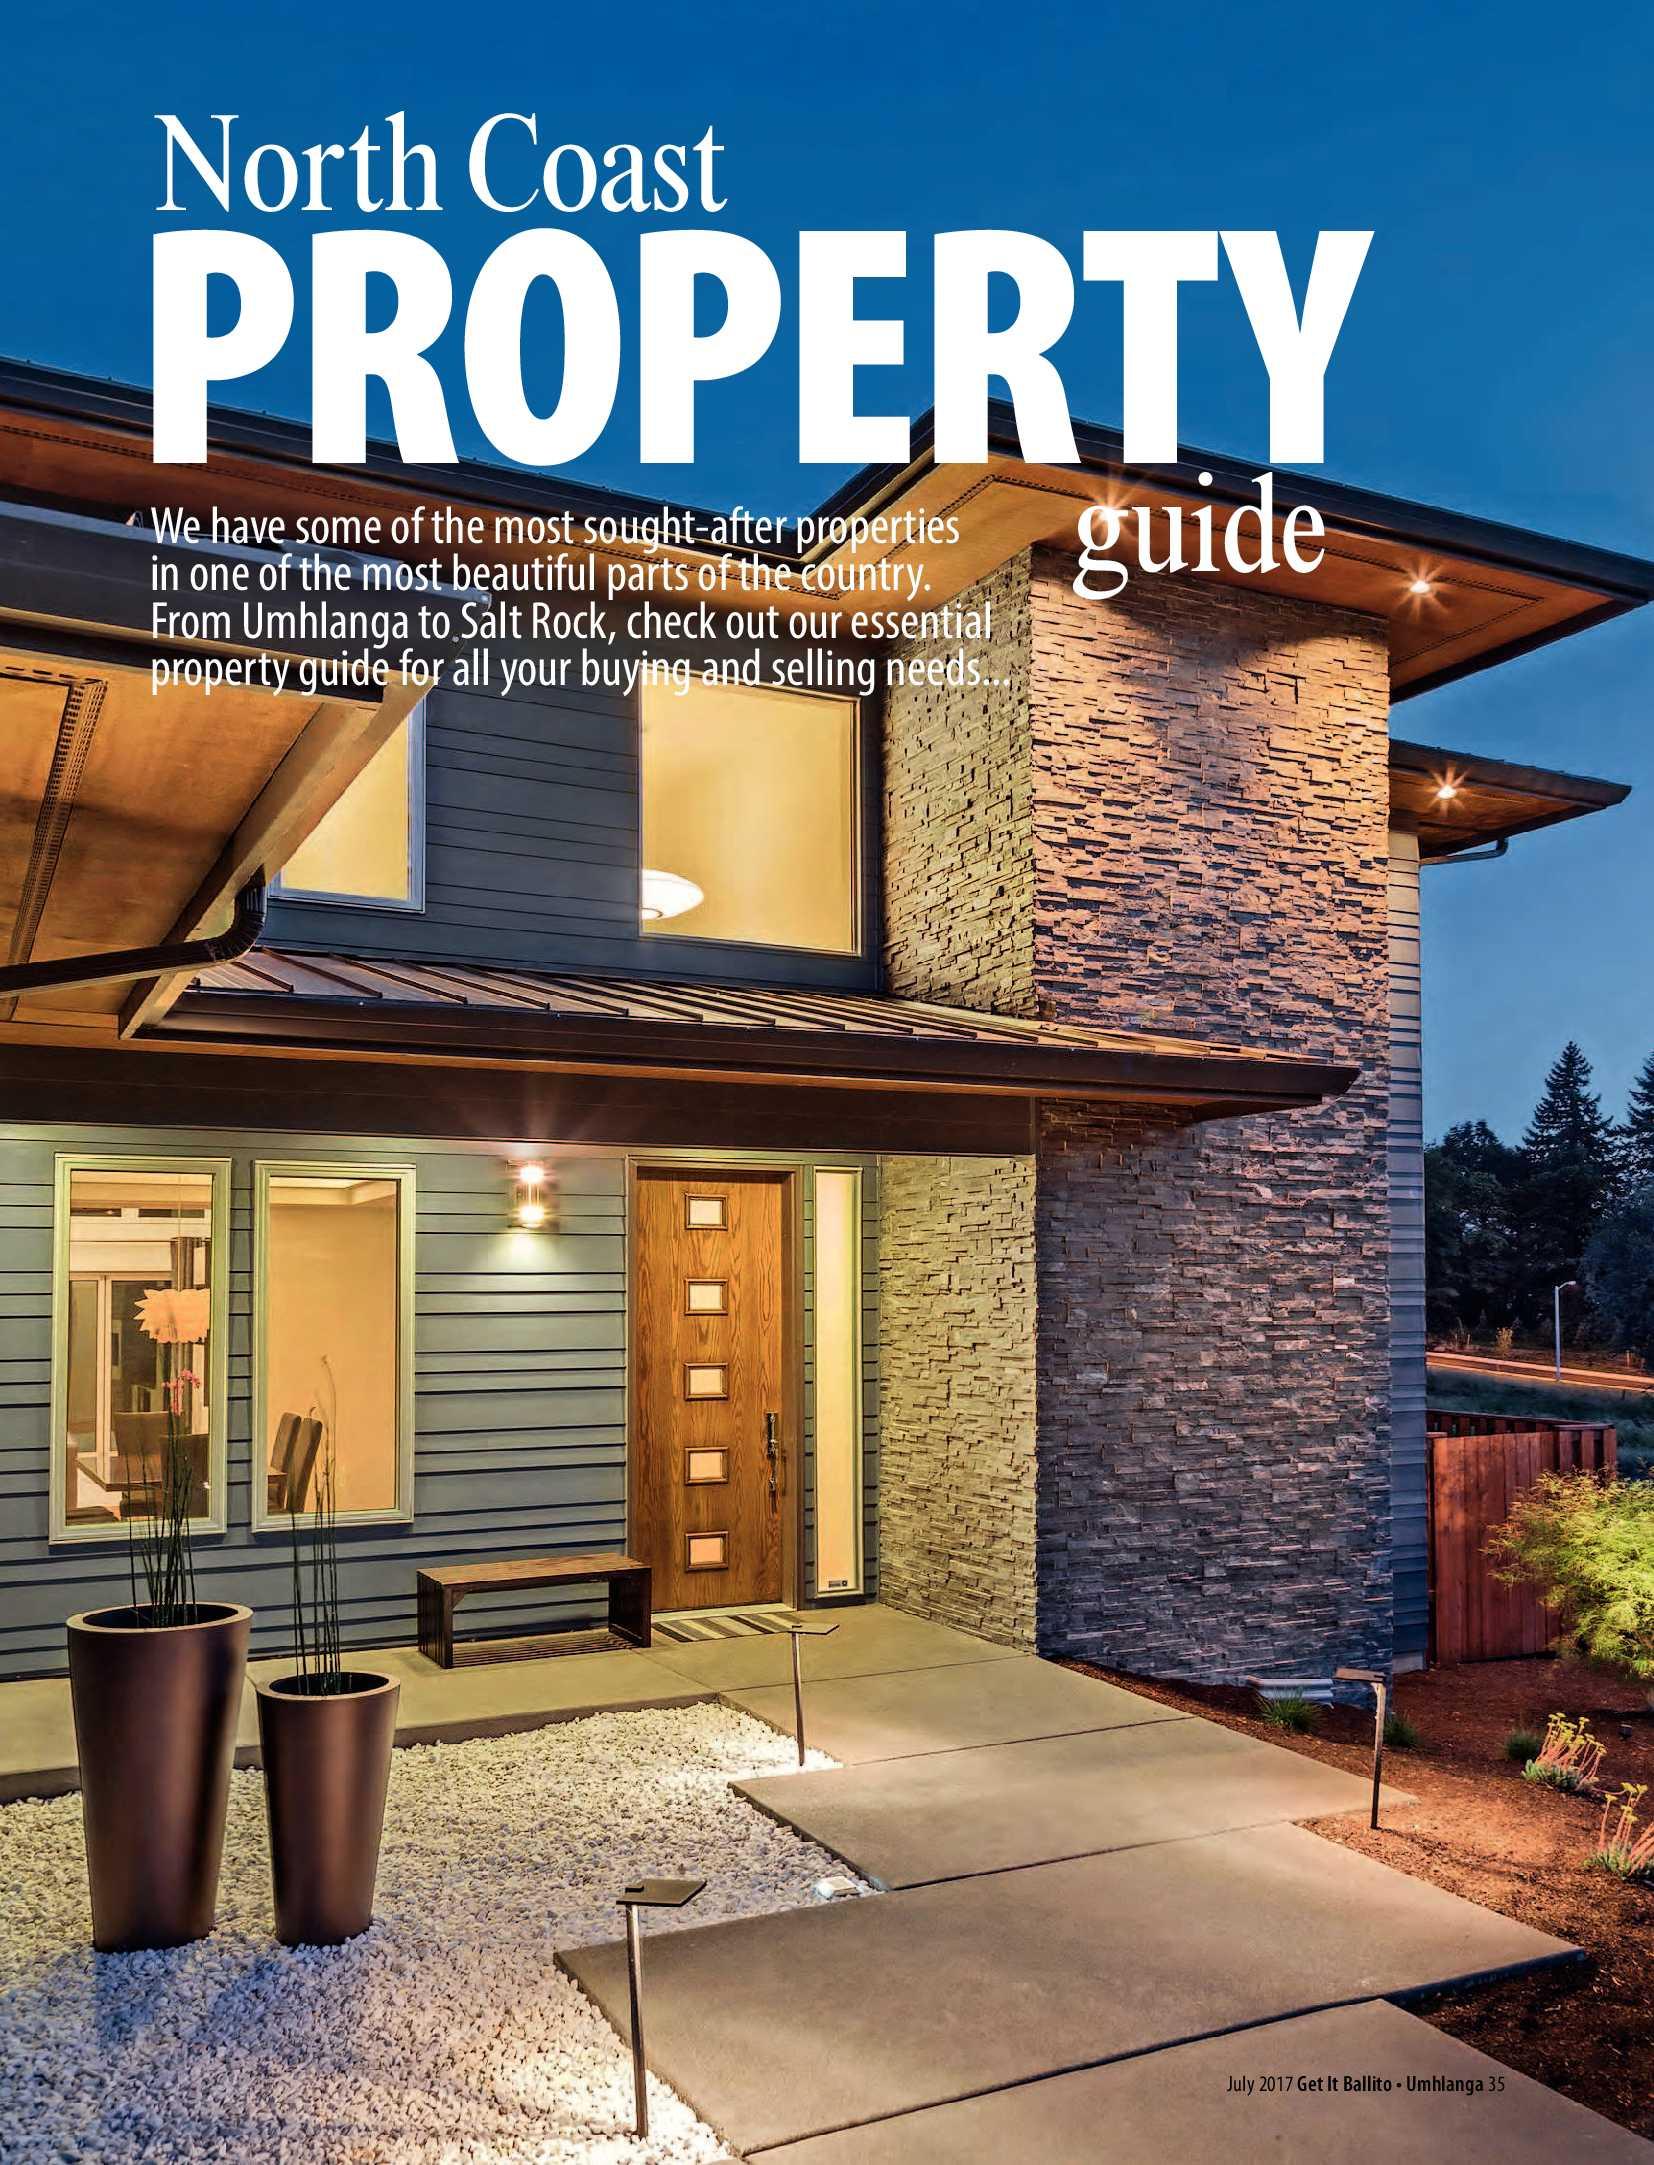 get-magazine-ballitoumhlanga-july-2017-2-epapers-page-37